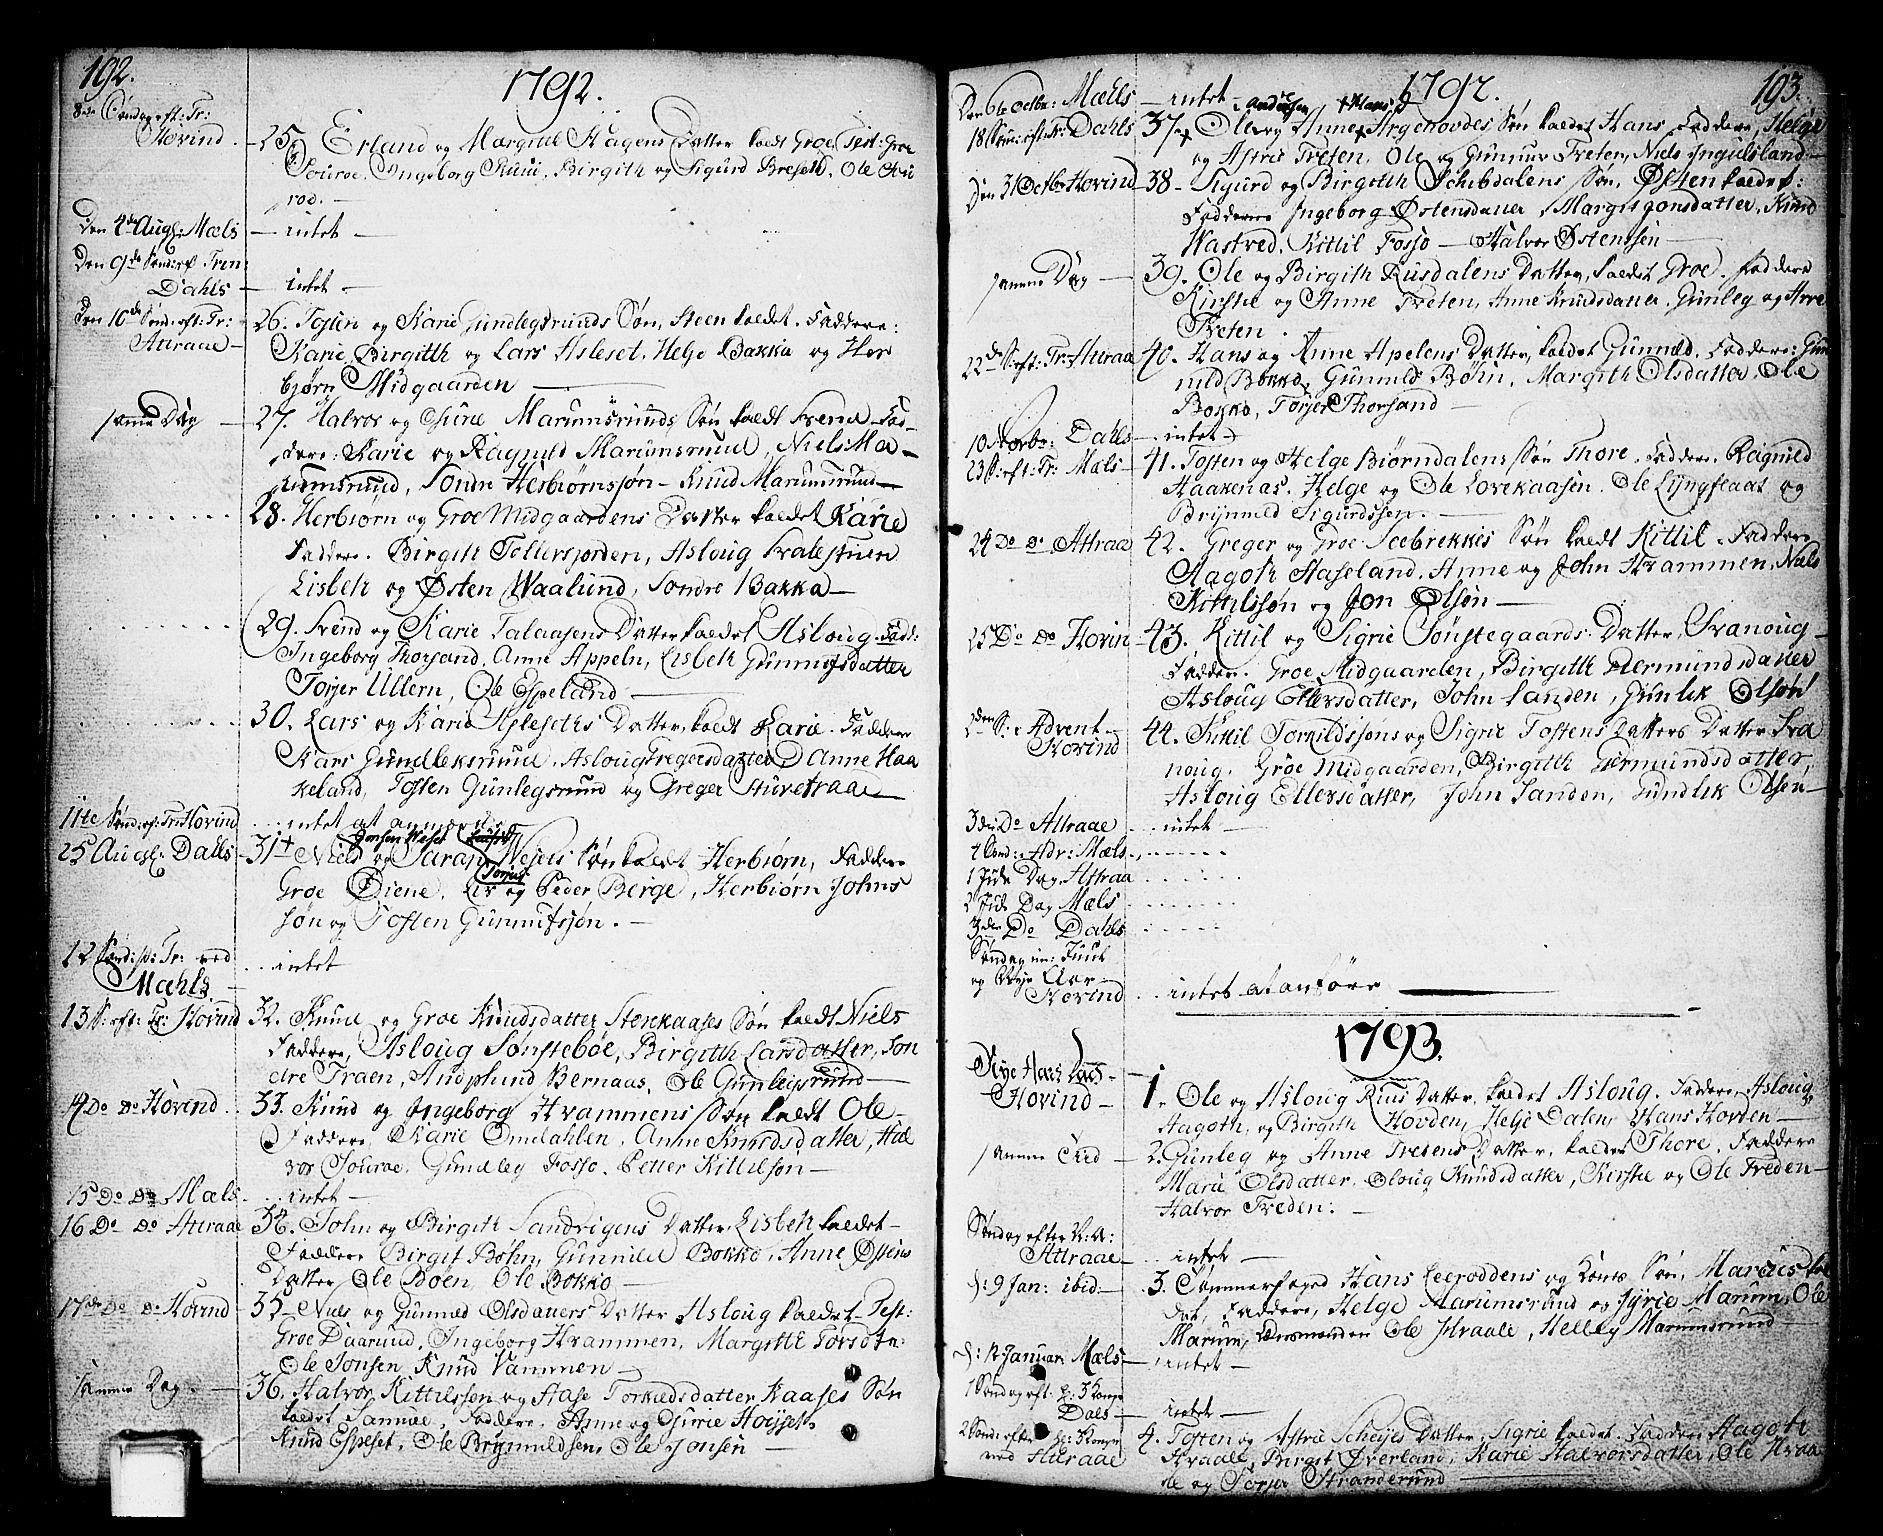 SAKO, Tinn kirkebøker, F/Fa/L0002: Ministerialbok nr. I 2, 1757-1810, s. 192-193